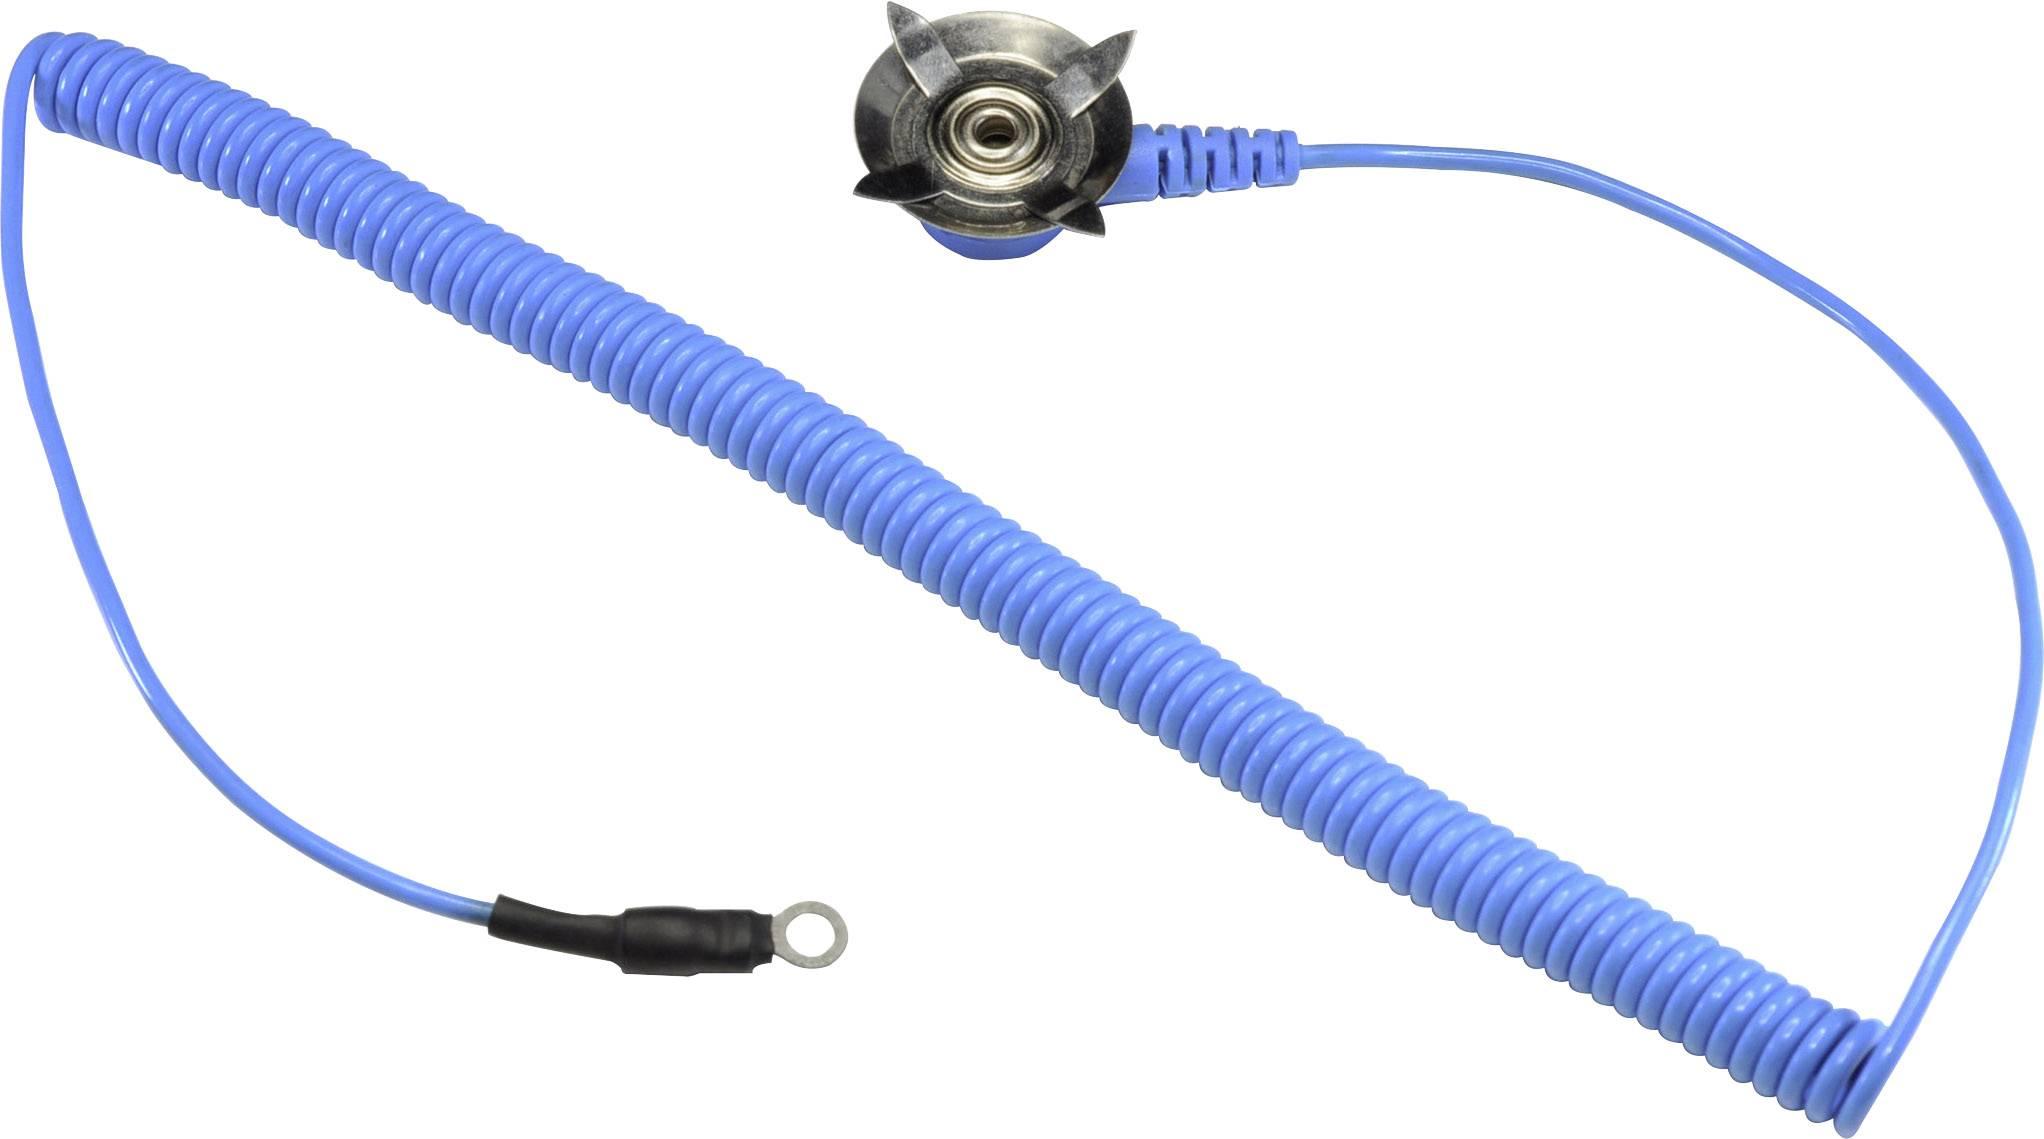 ESD zemnicí kabel k rohoži Conrad Components EkA-305-AD-R, 3.05 m EkA-305-AD-R prstencové očko 4 mm